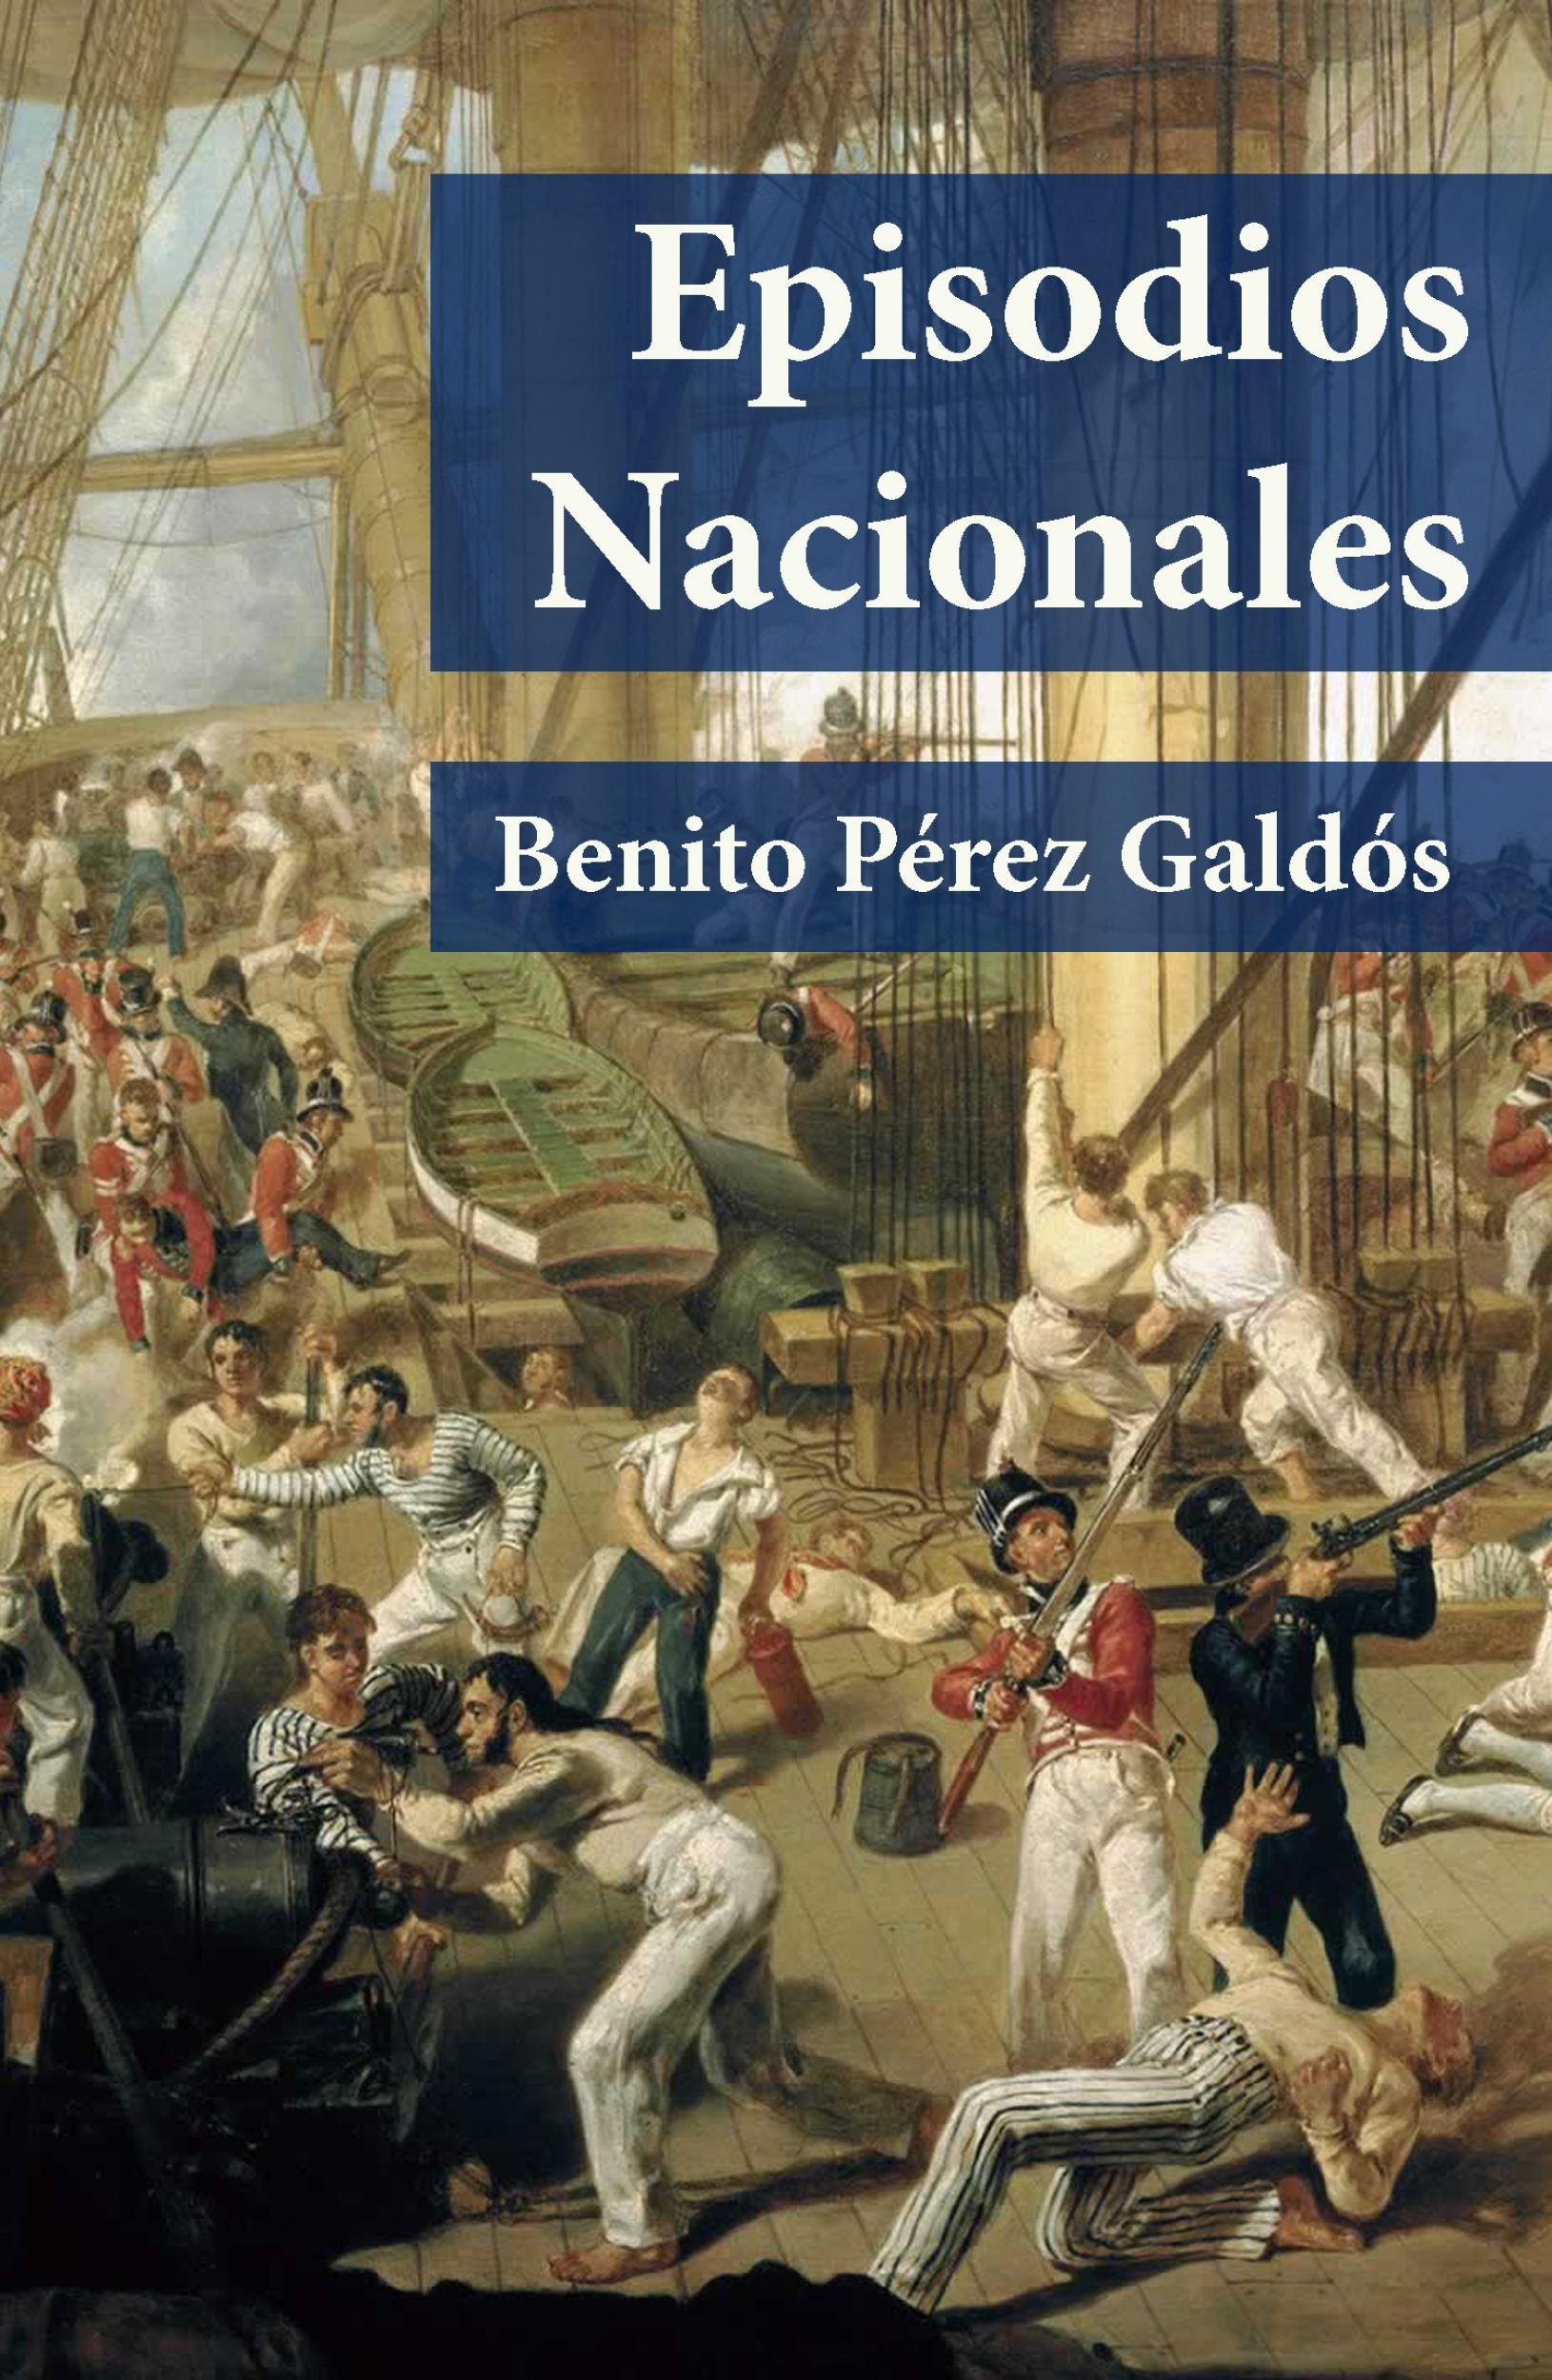 episodios-nacionales-benito-perez-galdos